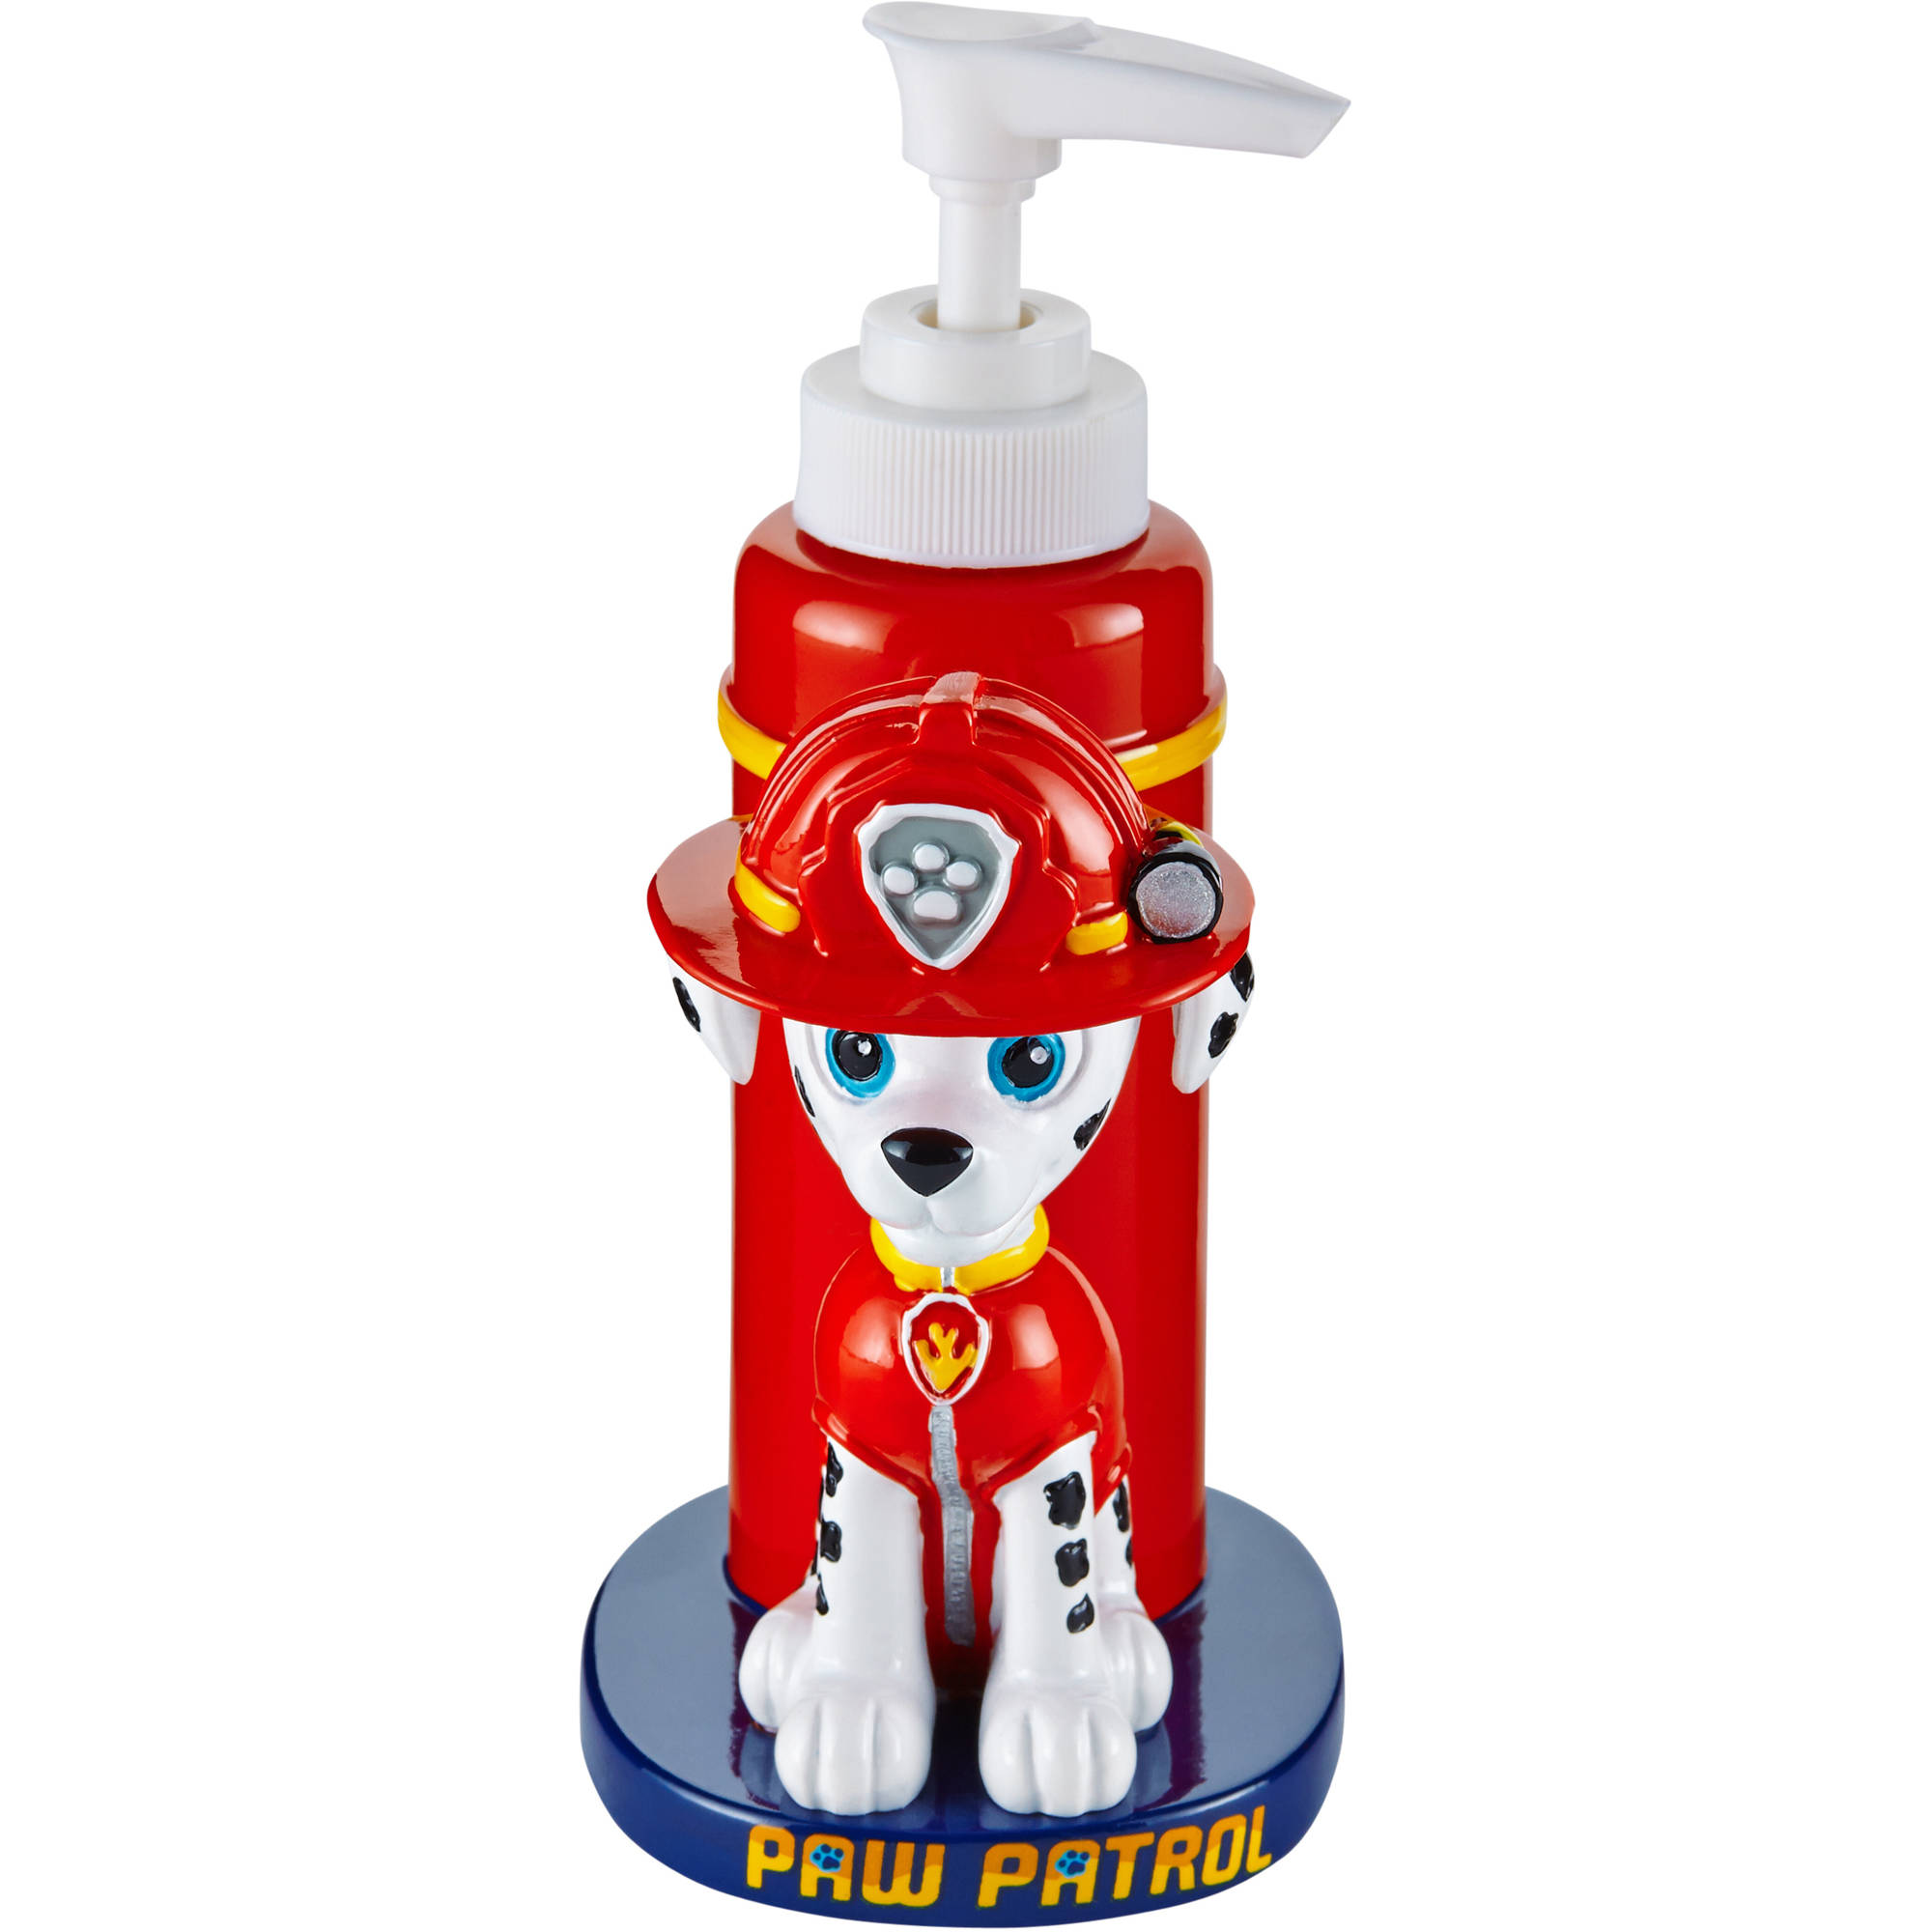 Nickelodeon Paw Patrol Lotion Pump